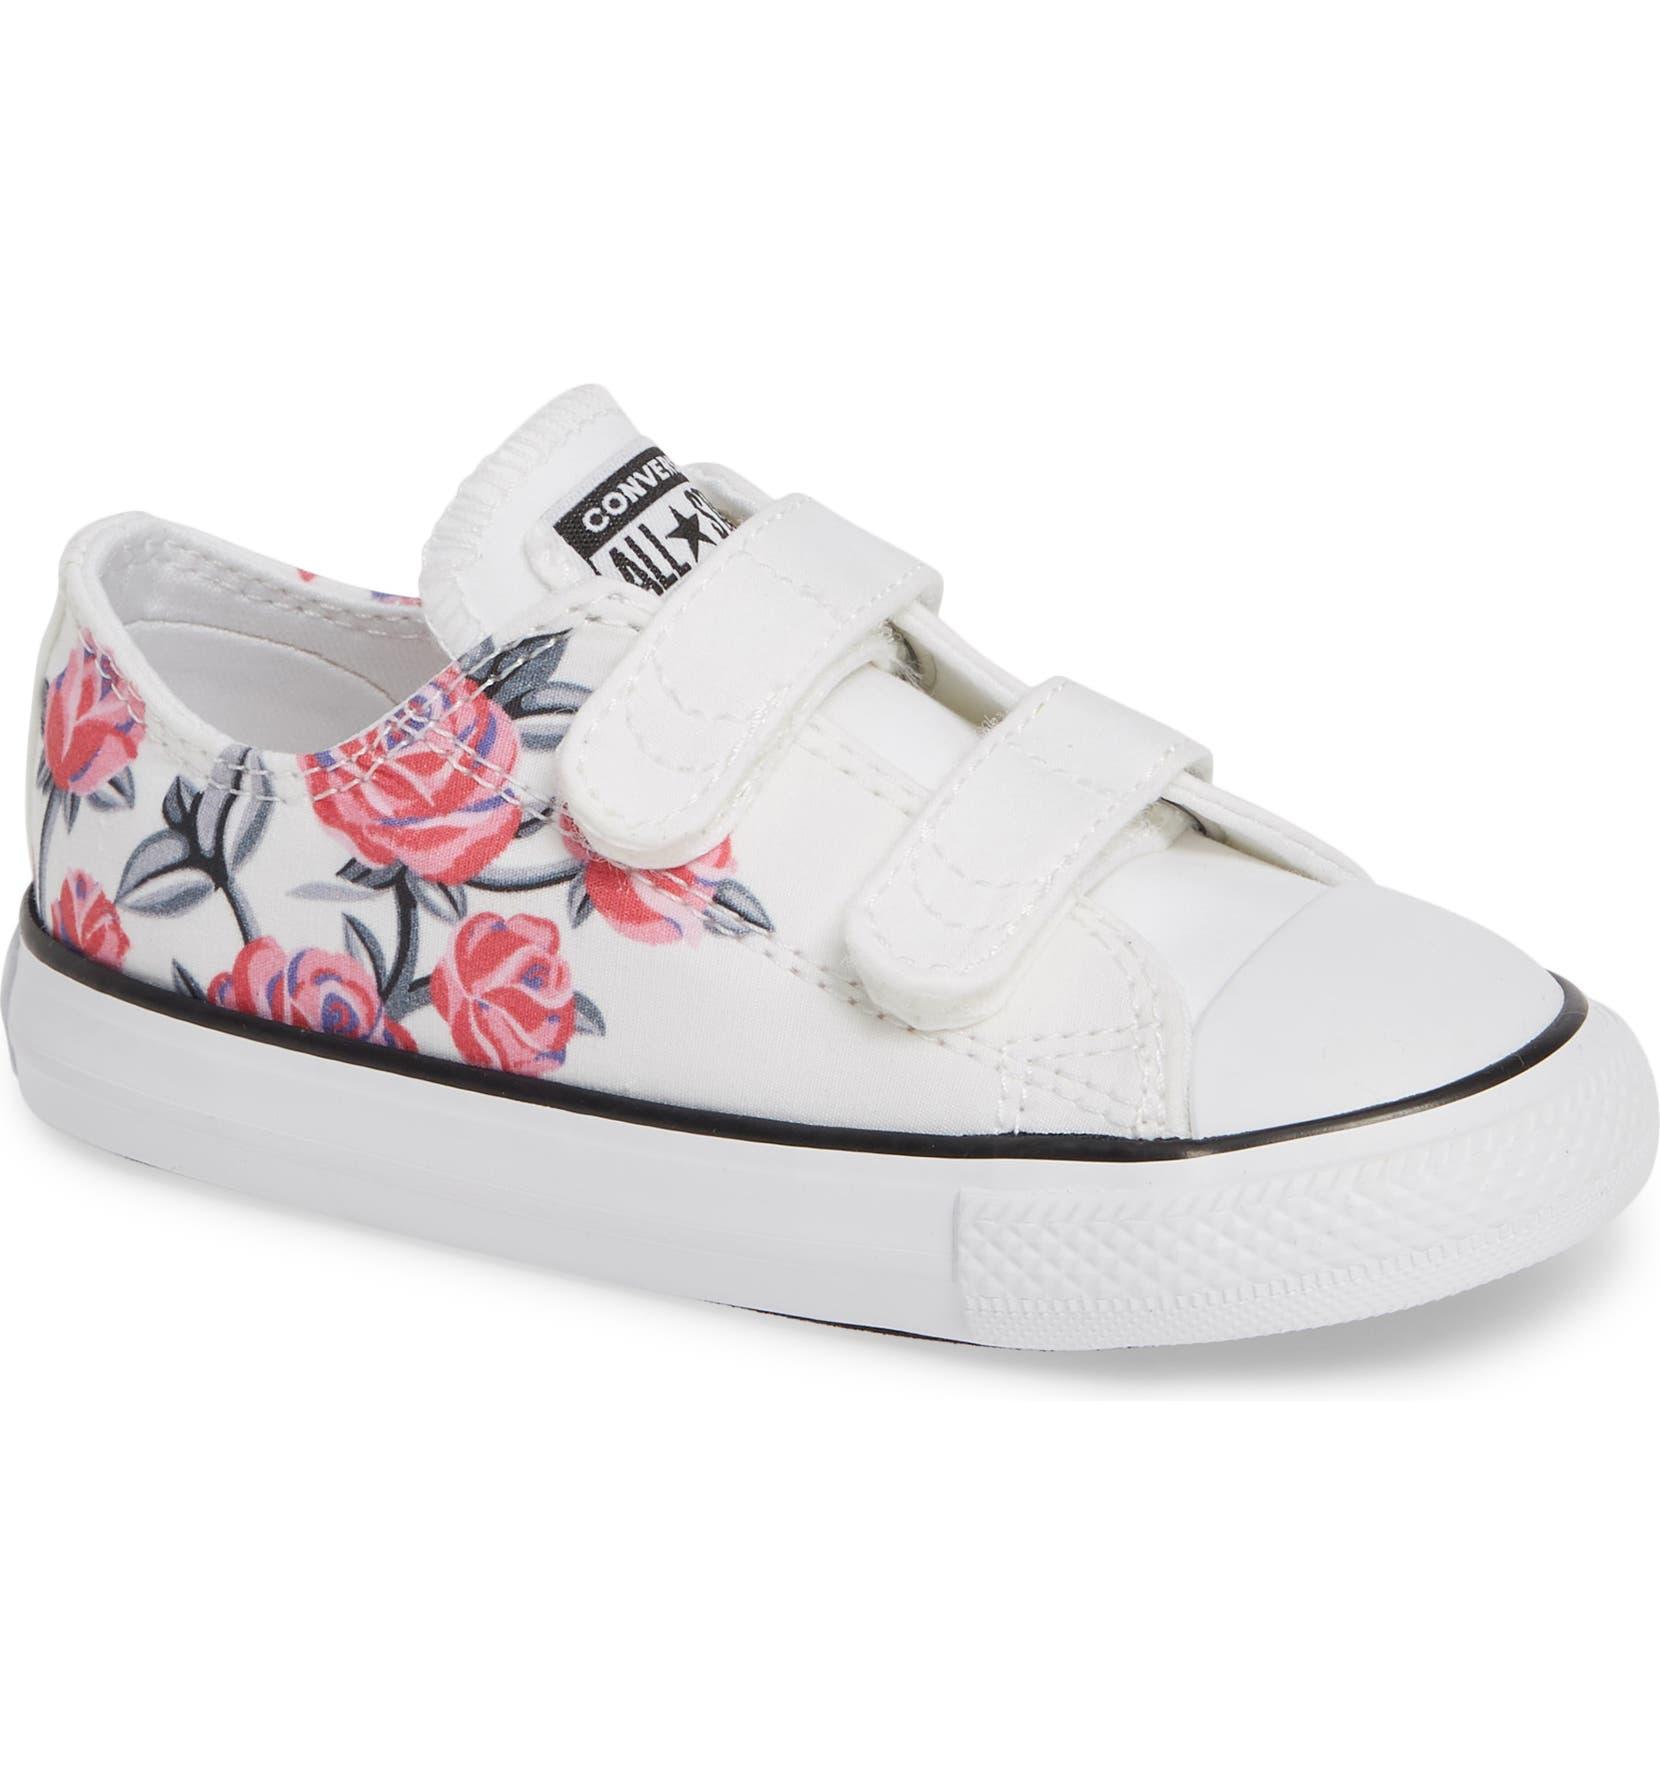 5ed36170de8d Converse Chuck Taylor® All Star® Pretty Strong 2V Sneaker (Baby ...